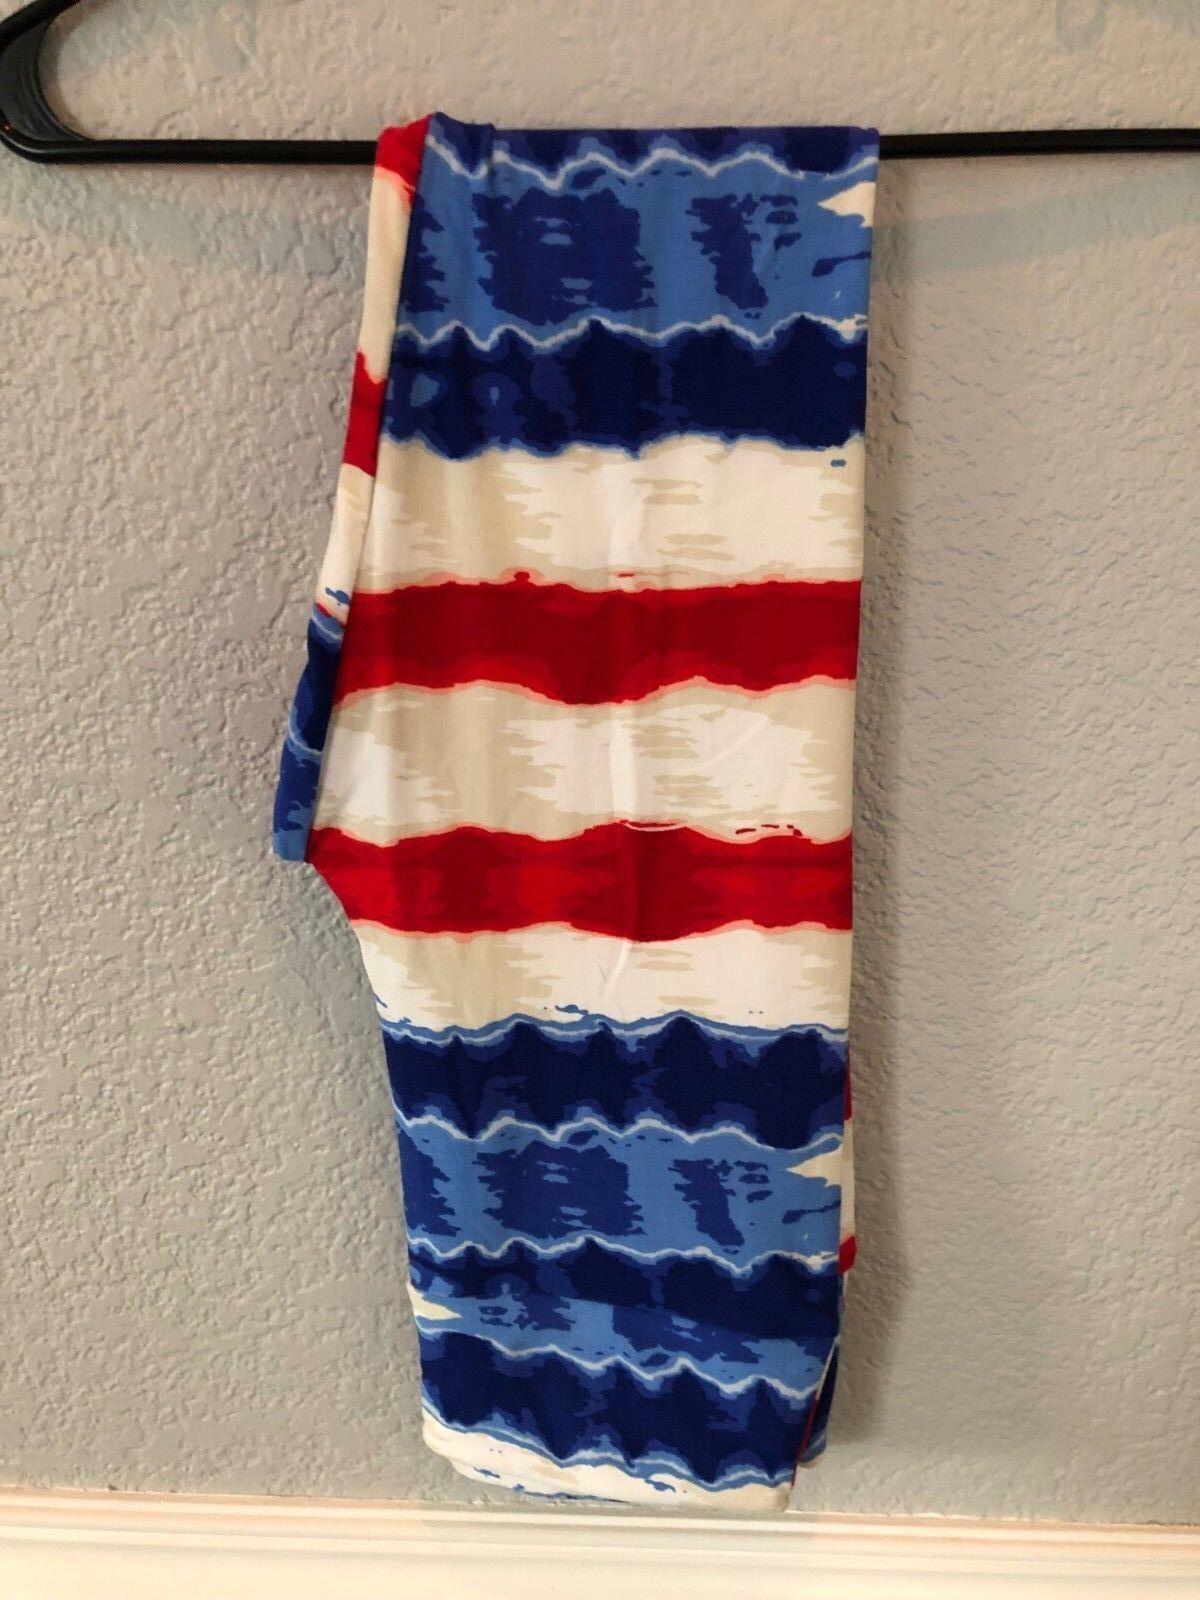 652541ab47eac NWT LuLaRoe Leggings OS American Dreams Red White & bluee Tie Dye SUPER  CUTE HTF